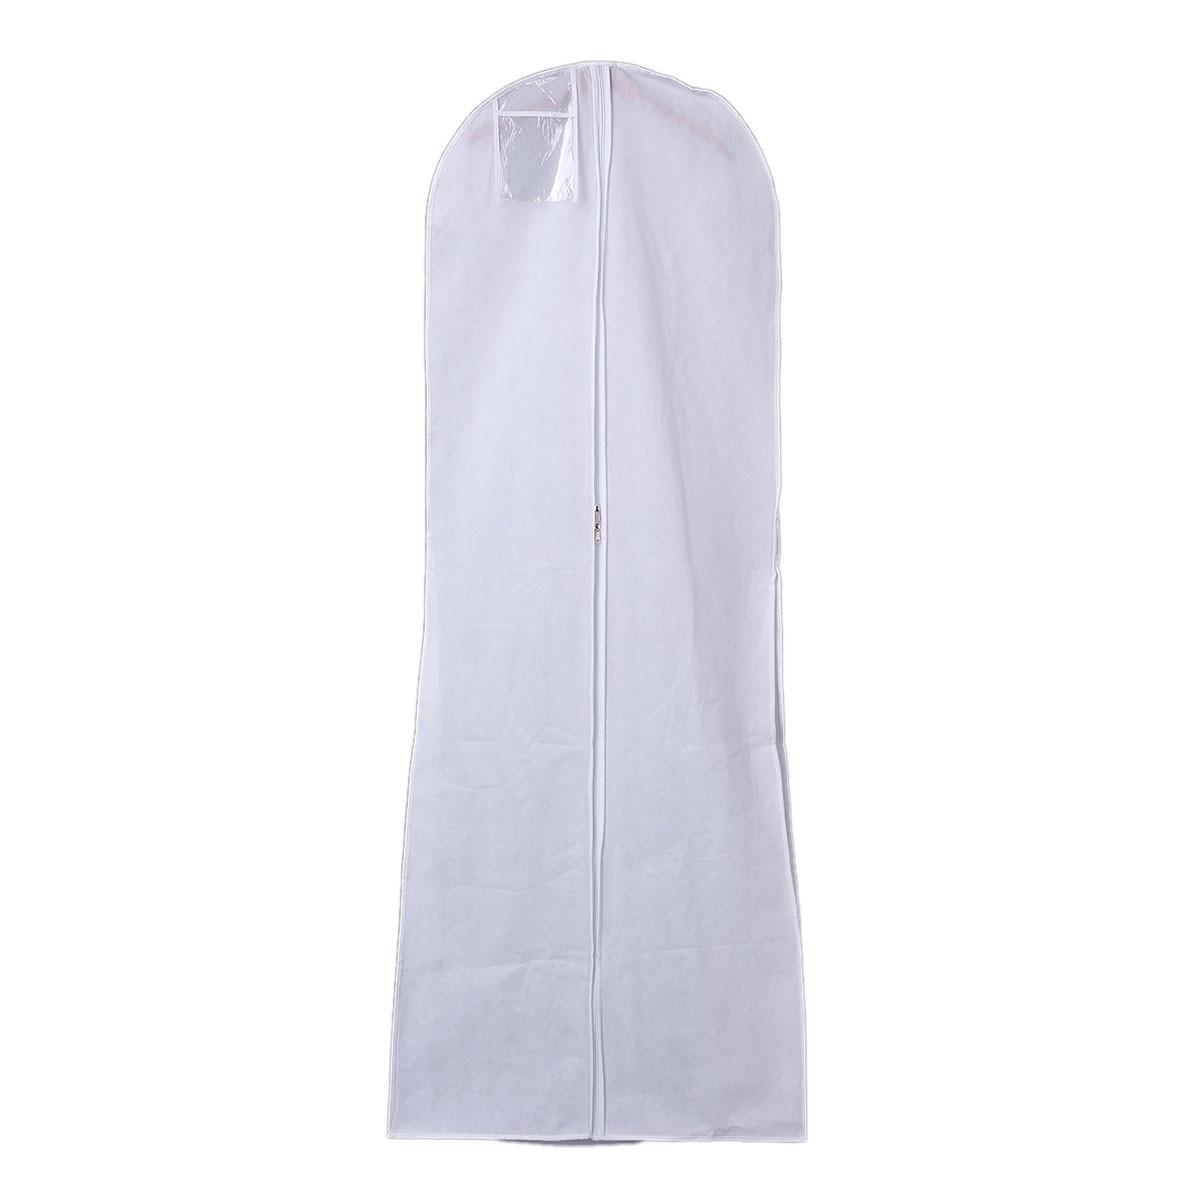 Hanging Wedding Dress Bridal Gown Garment Cover Storage Bag Carry Zip Dustproof White